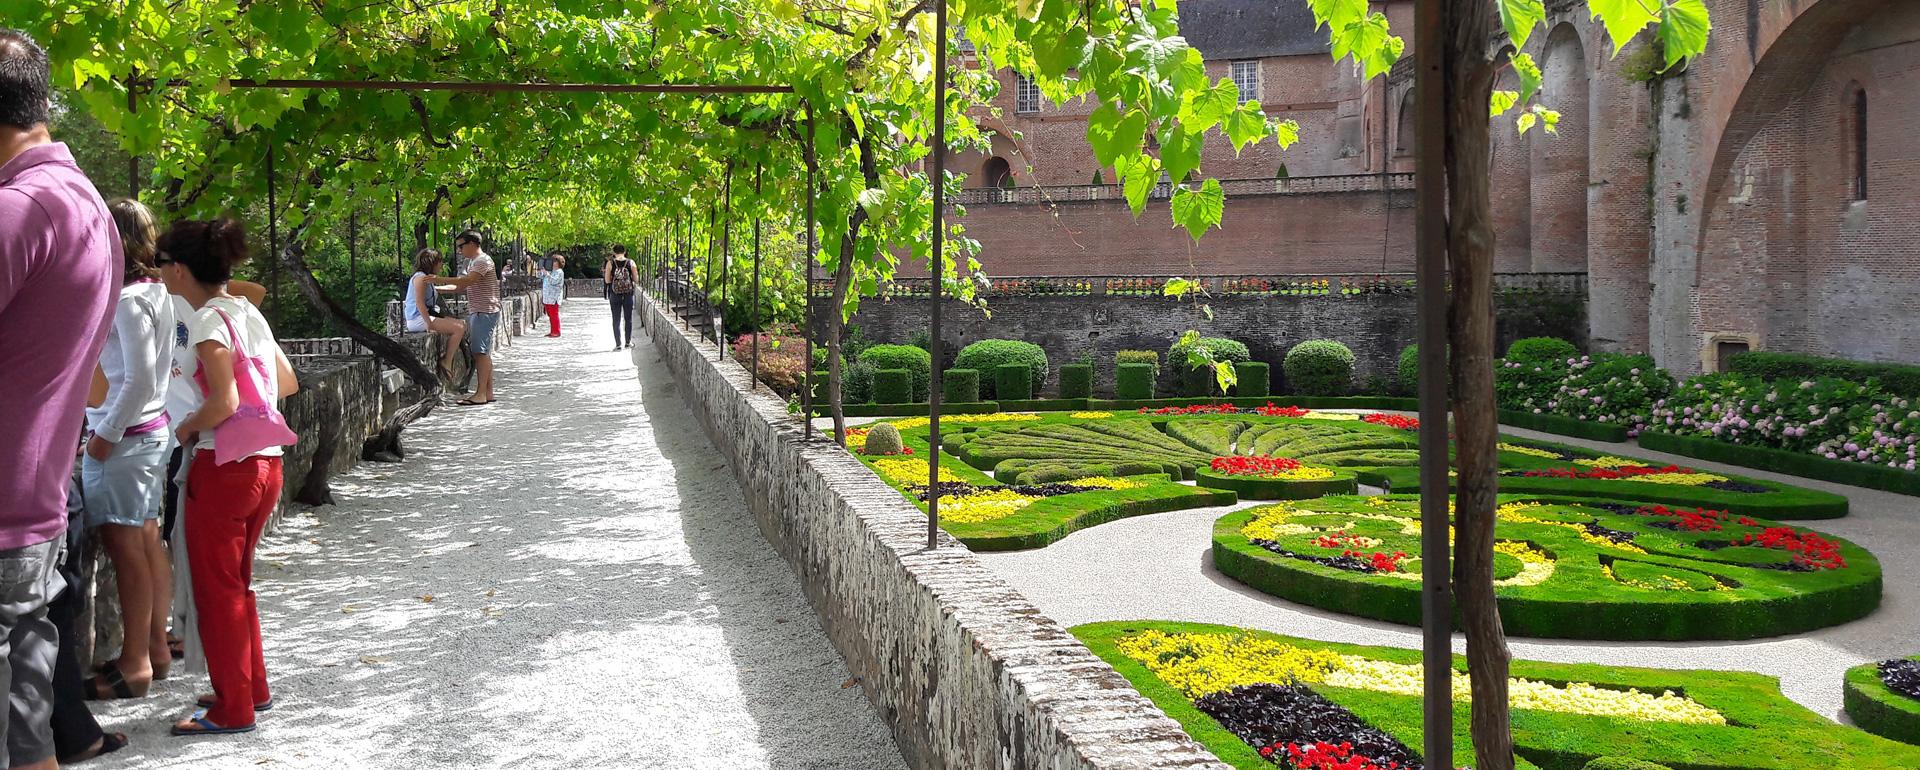 Jardins du Palais de la Berbie - Albi - Tarn